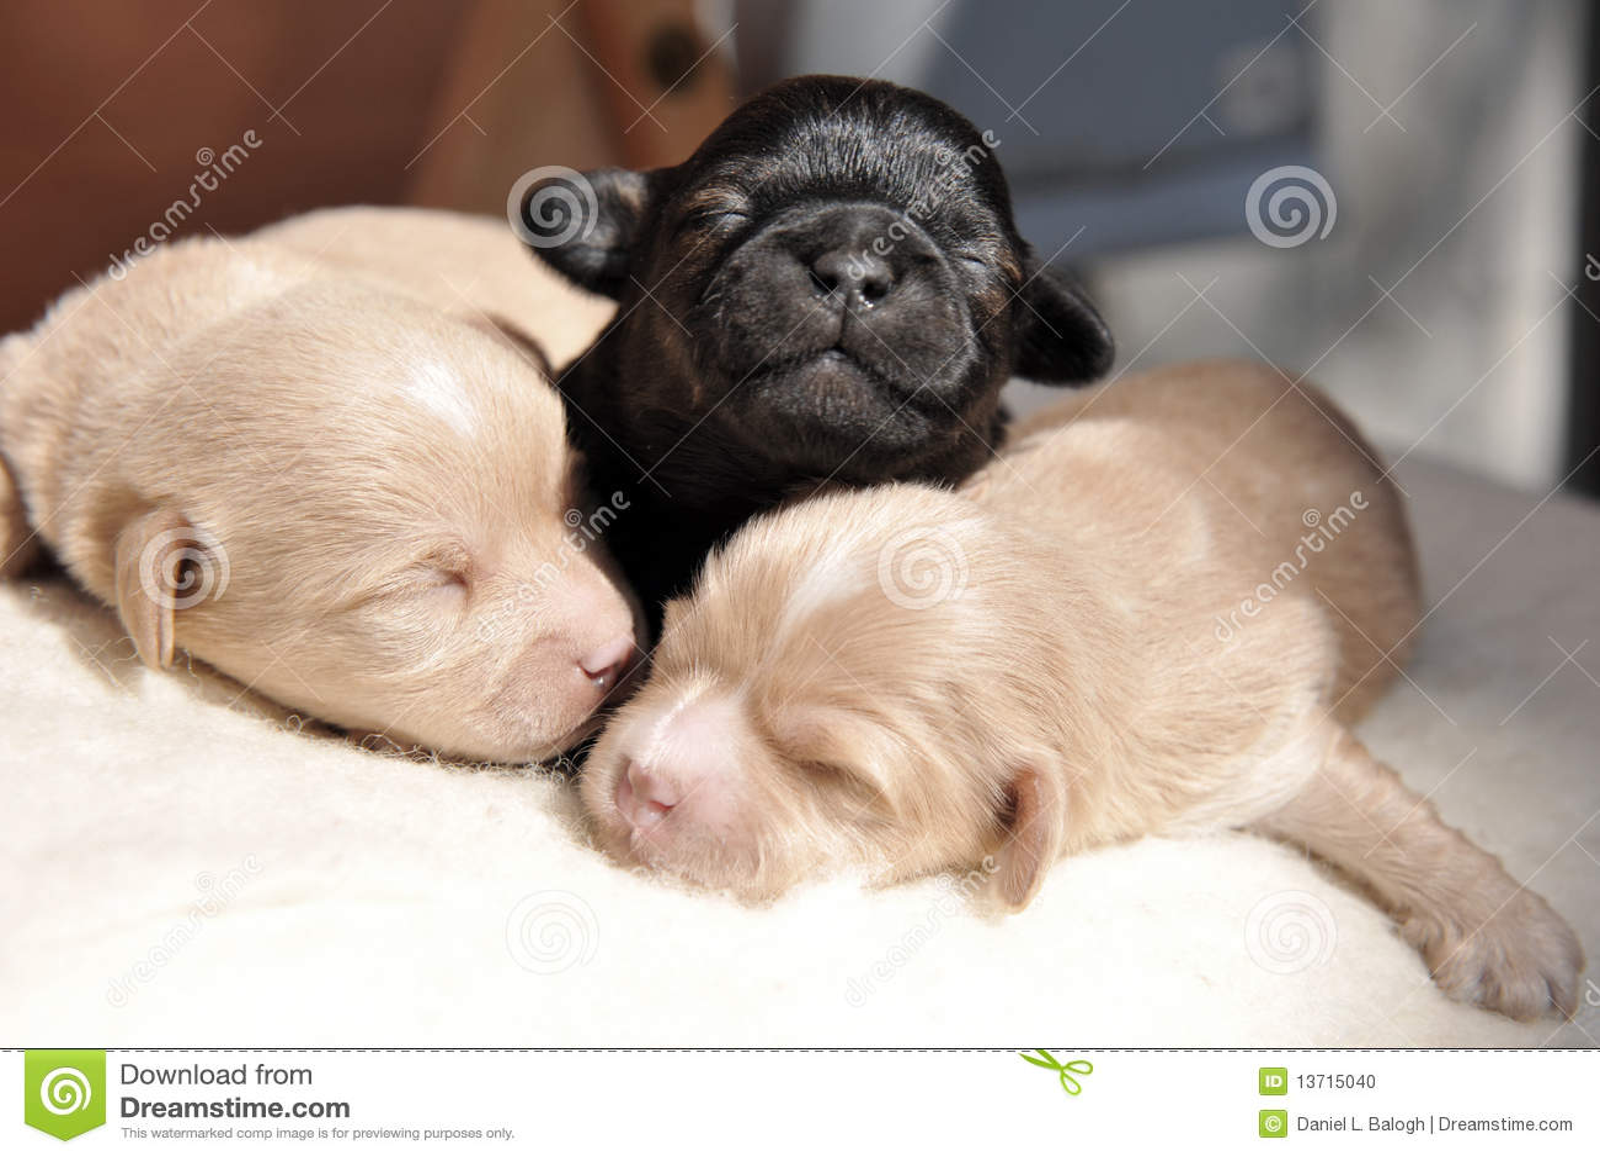 Newborn Puppies Stock Photo Image 13715040